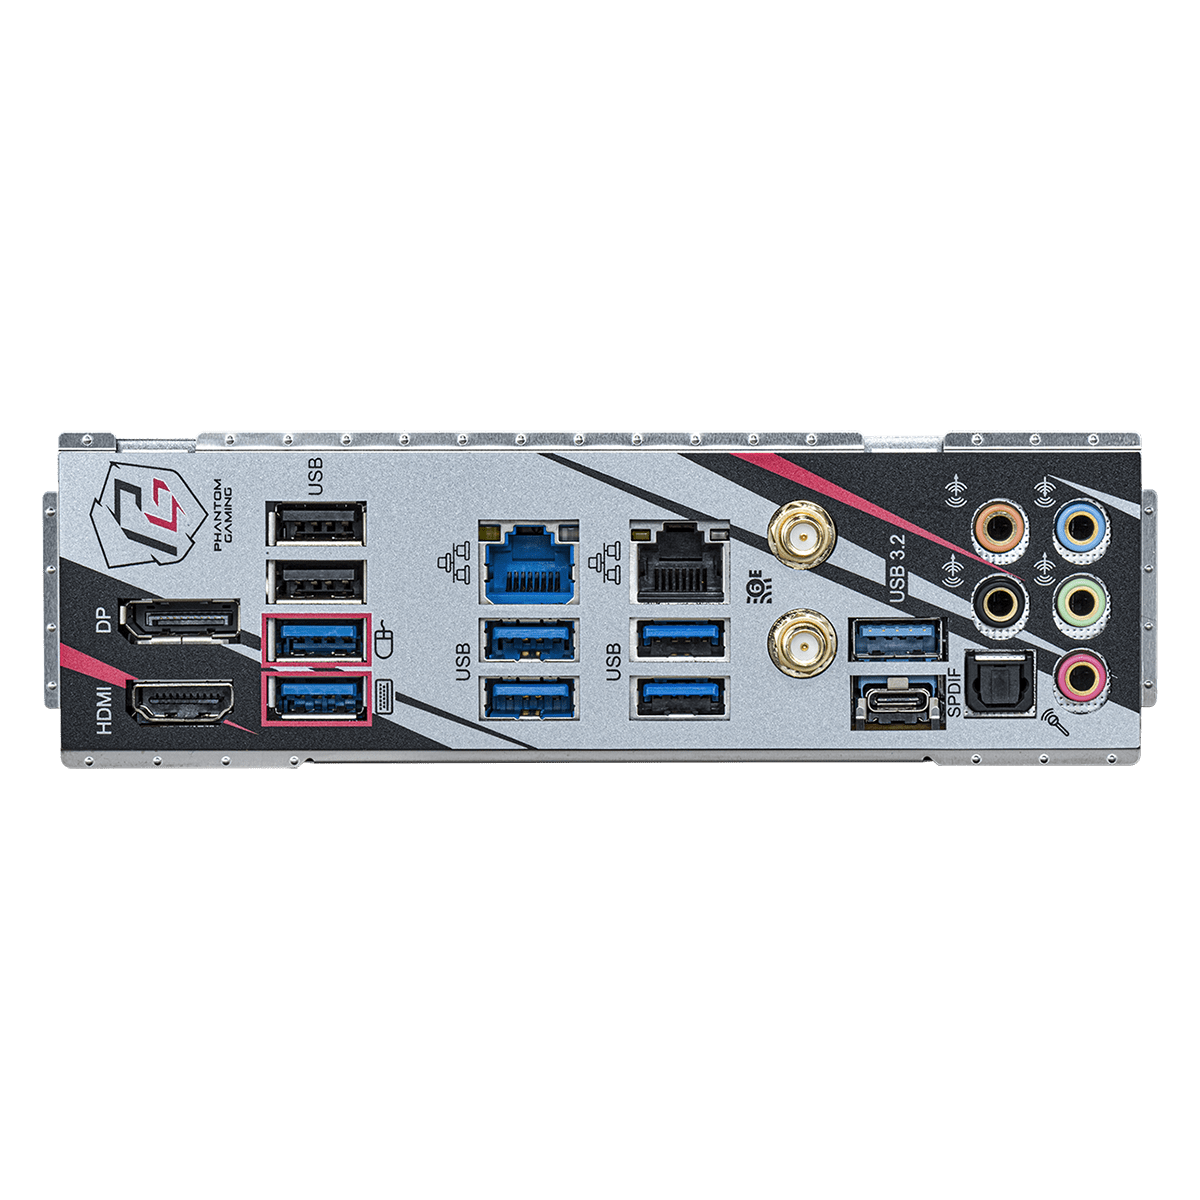 Placa Mãe ASRock Z590 PG Velocita, Chipset Intel Z590, Socket 1200, ATX, DDR4